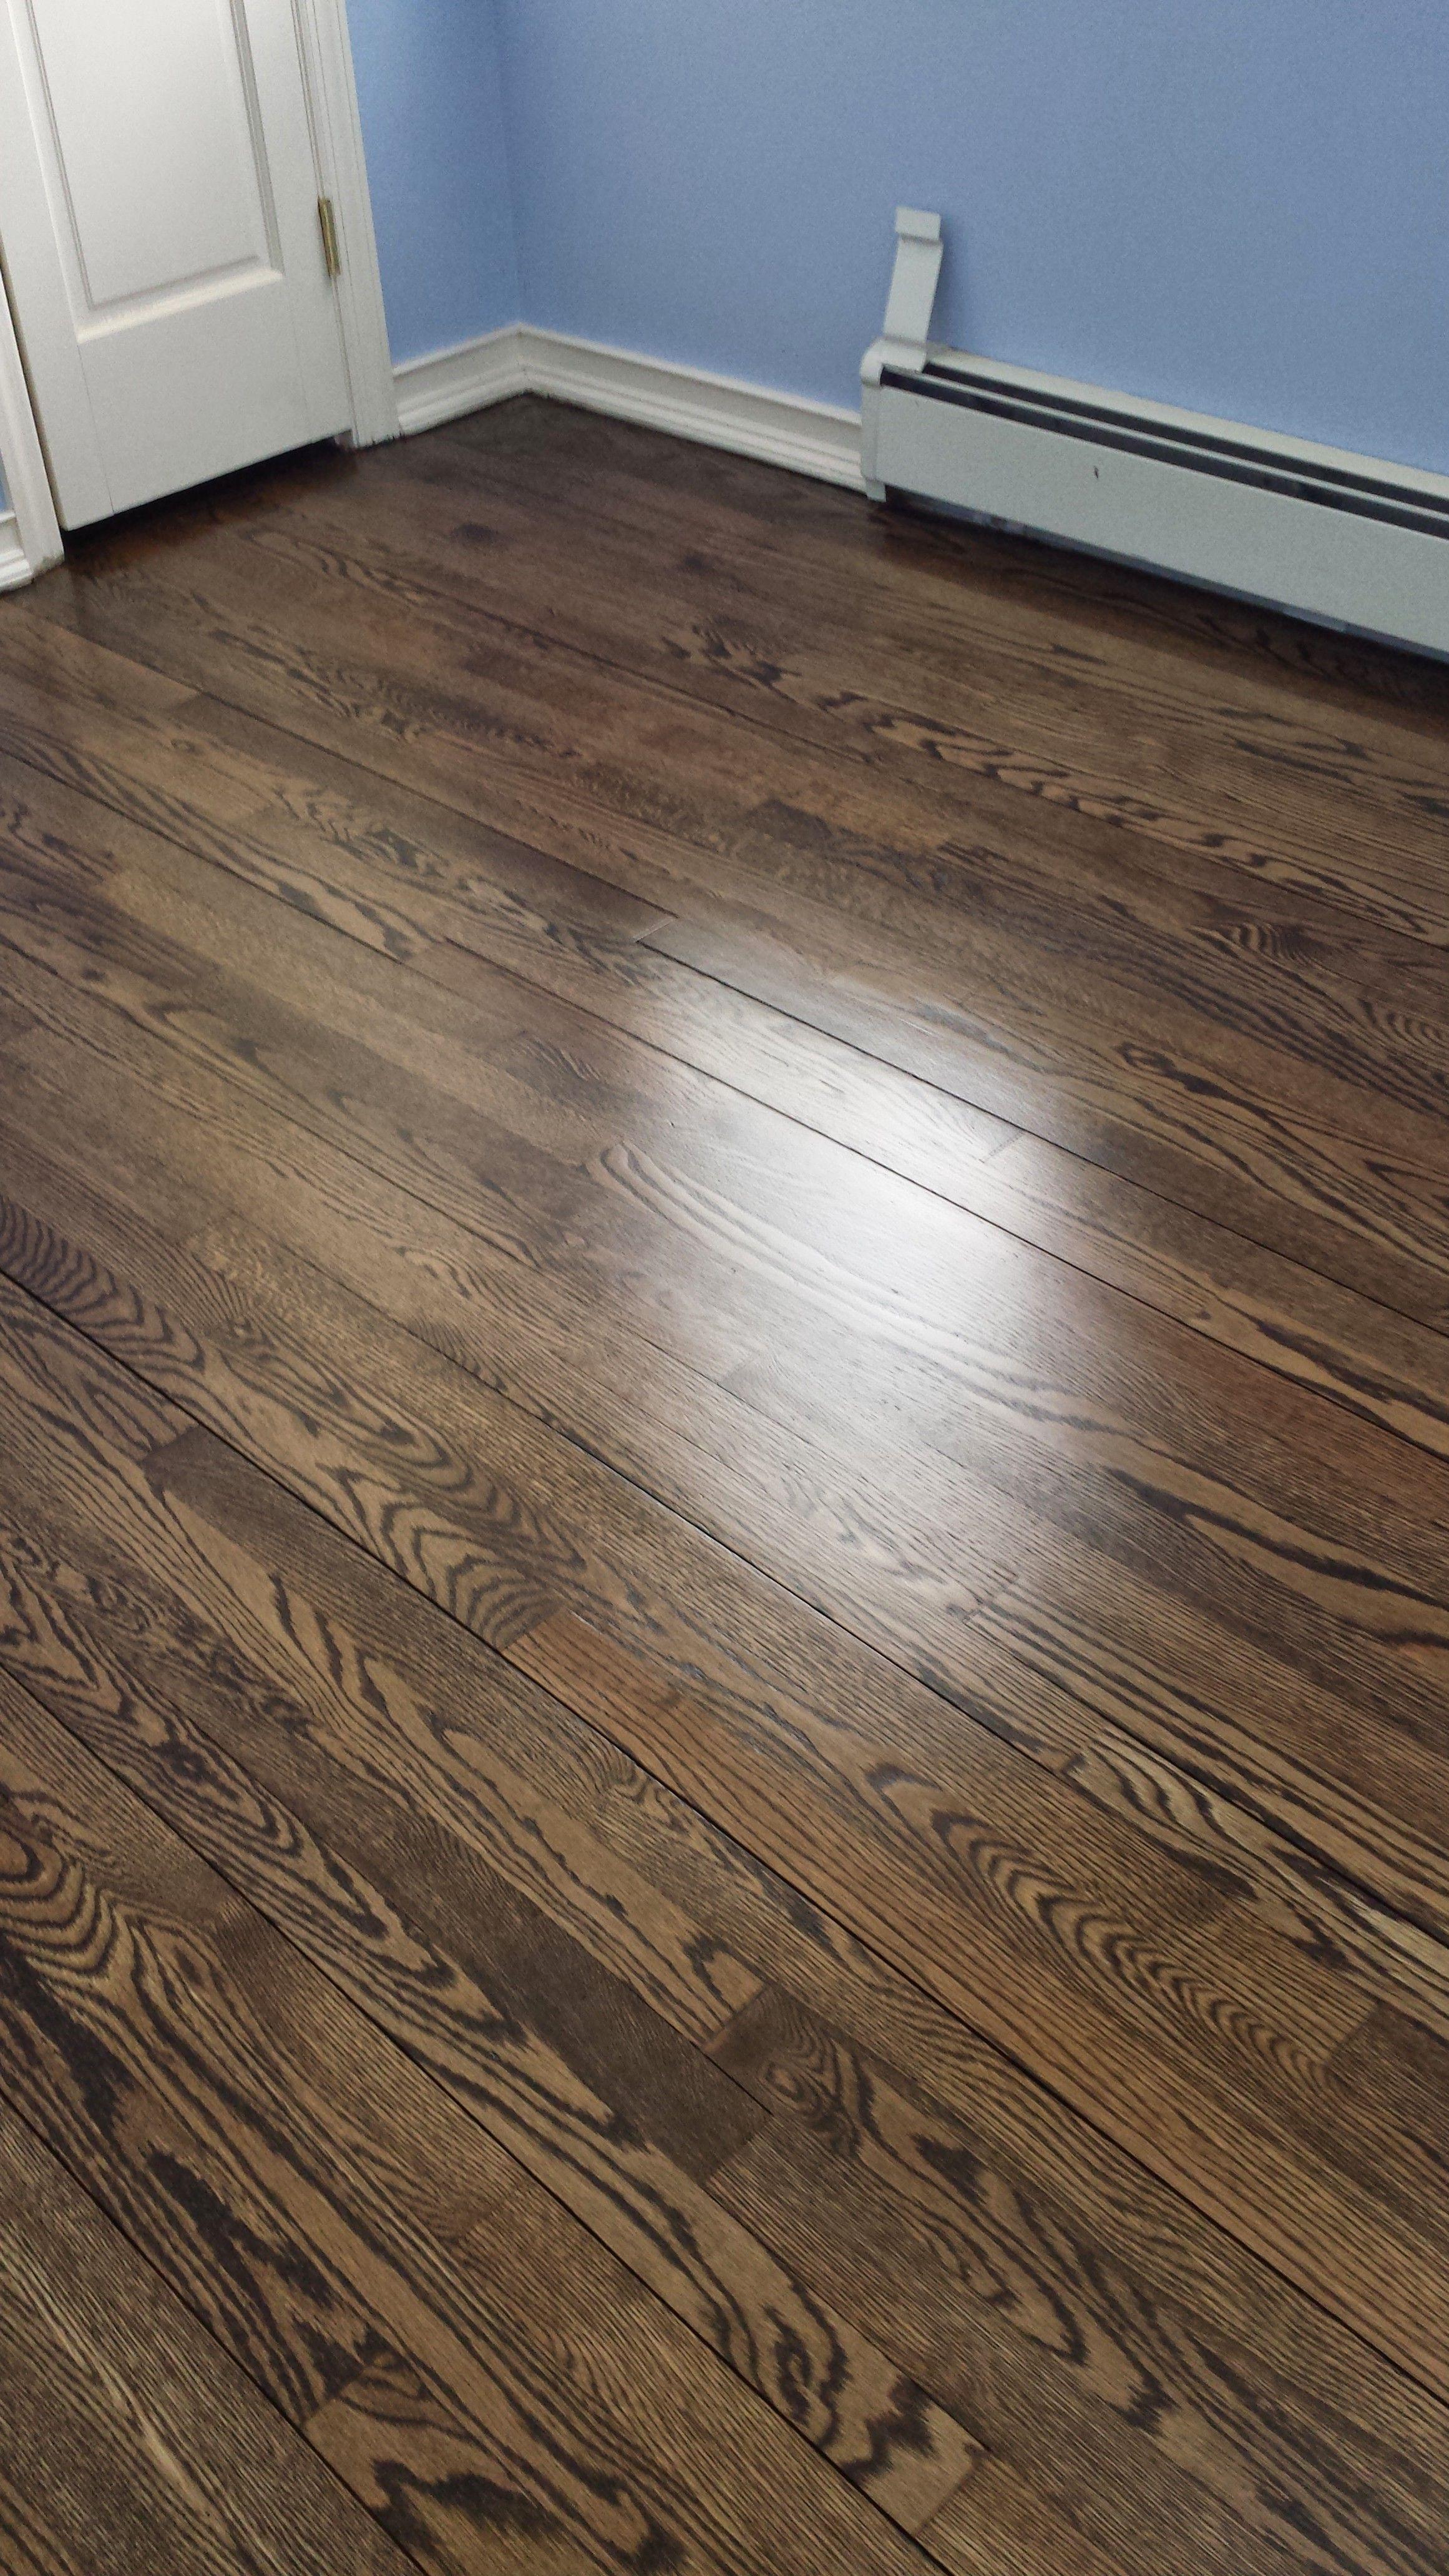 herringbone hardwood floor installation cost of how to install wood floors floor transition laminate to herringbone with gallery of how to install wood floors floor transition laminate to herringbone tile pattern